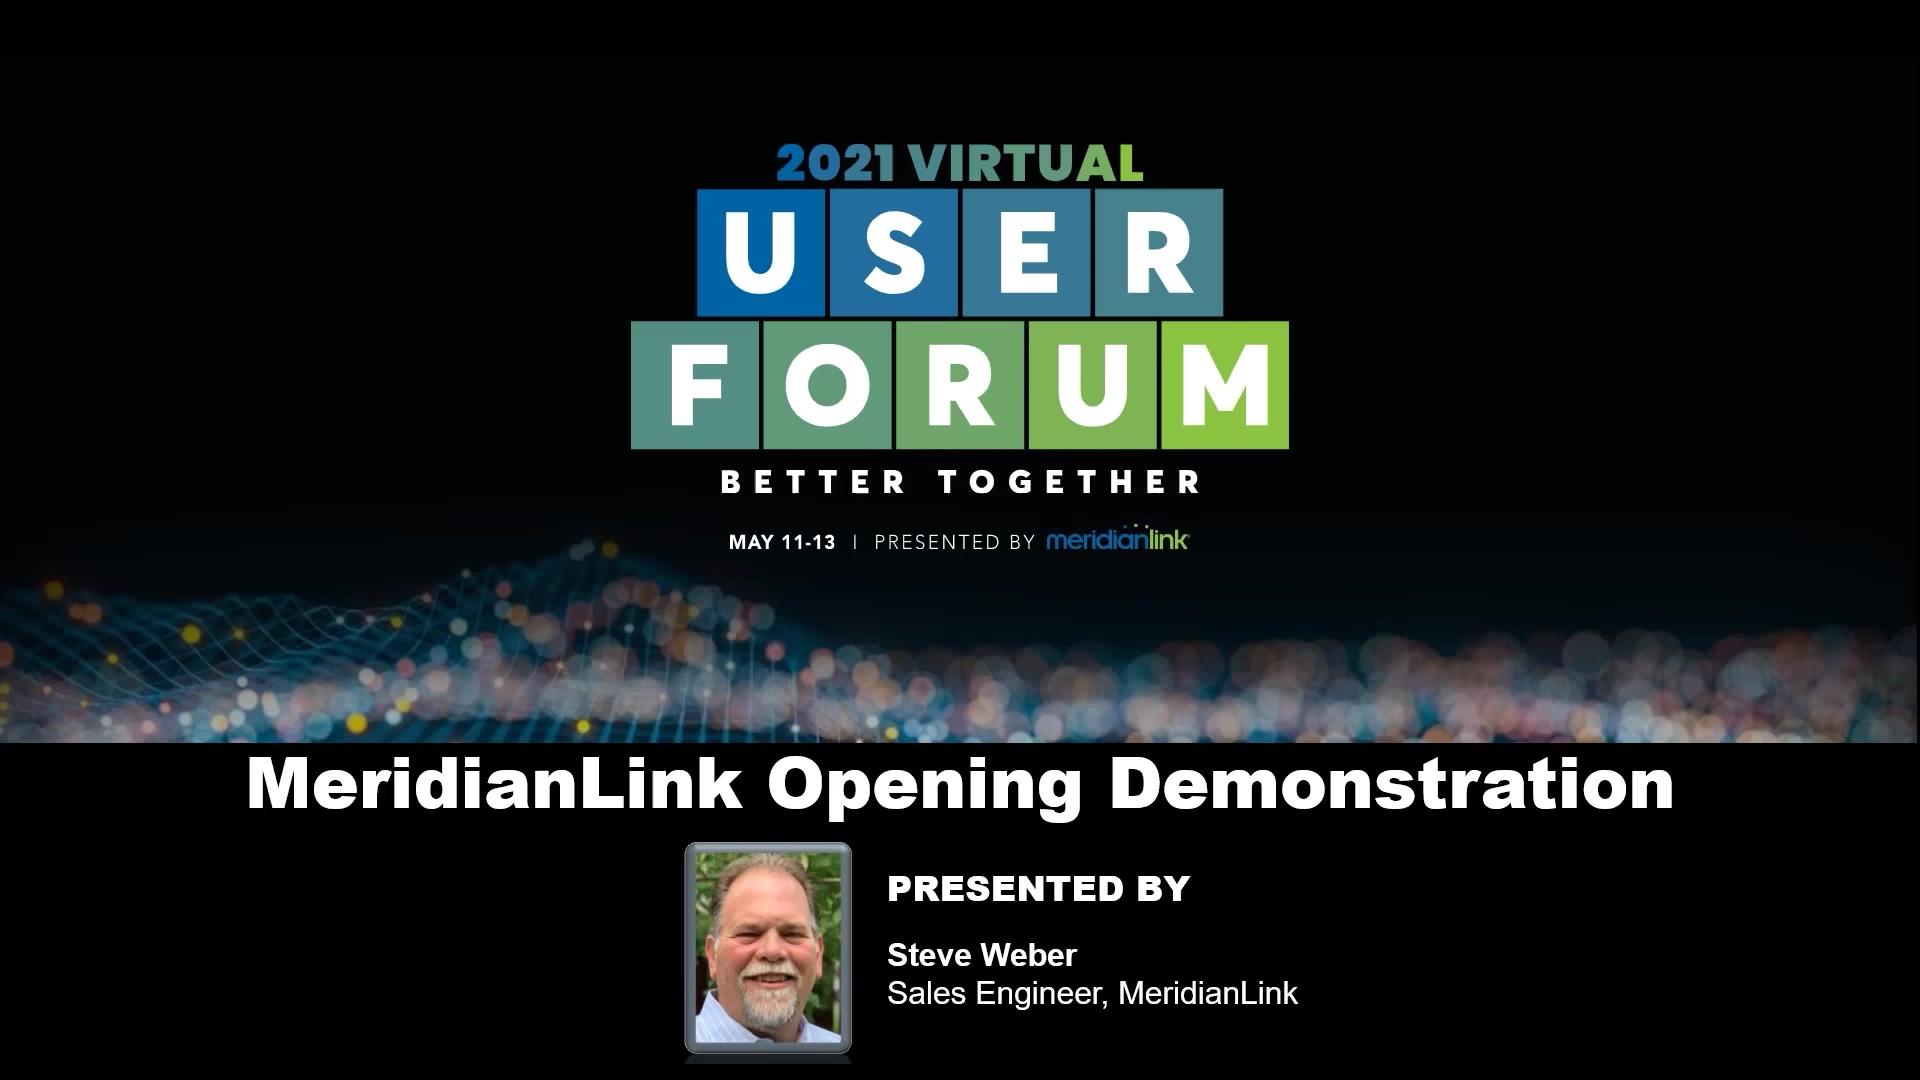 MeridianLink Opening Demonstration